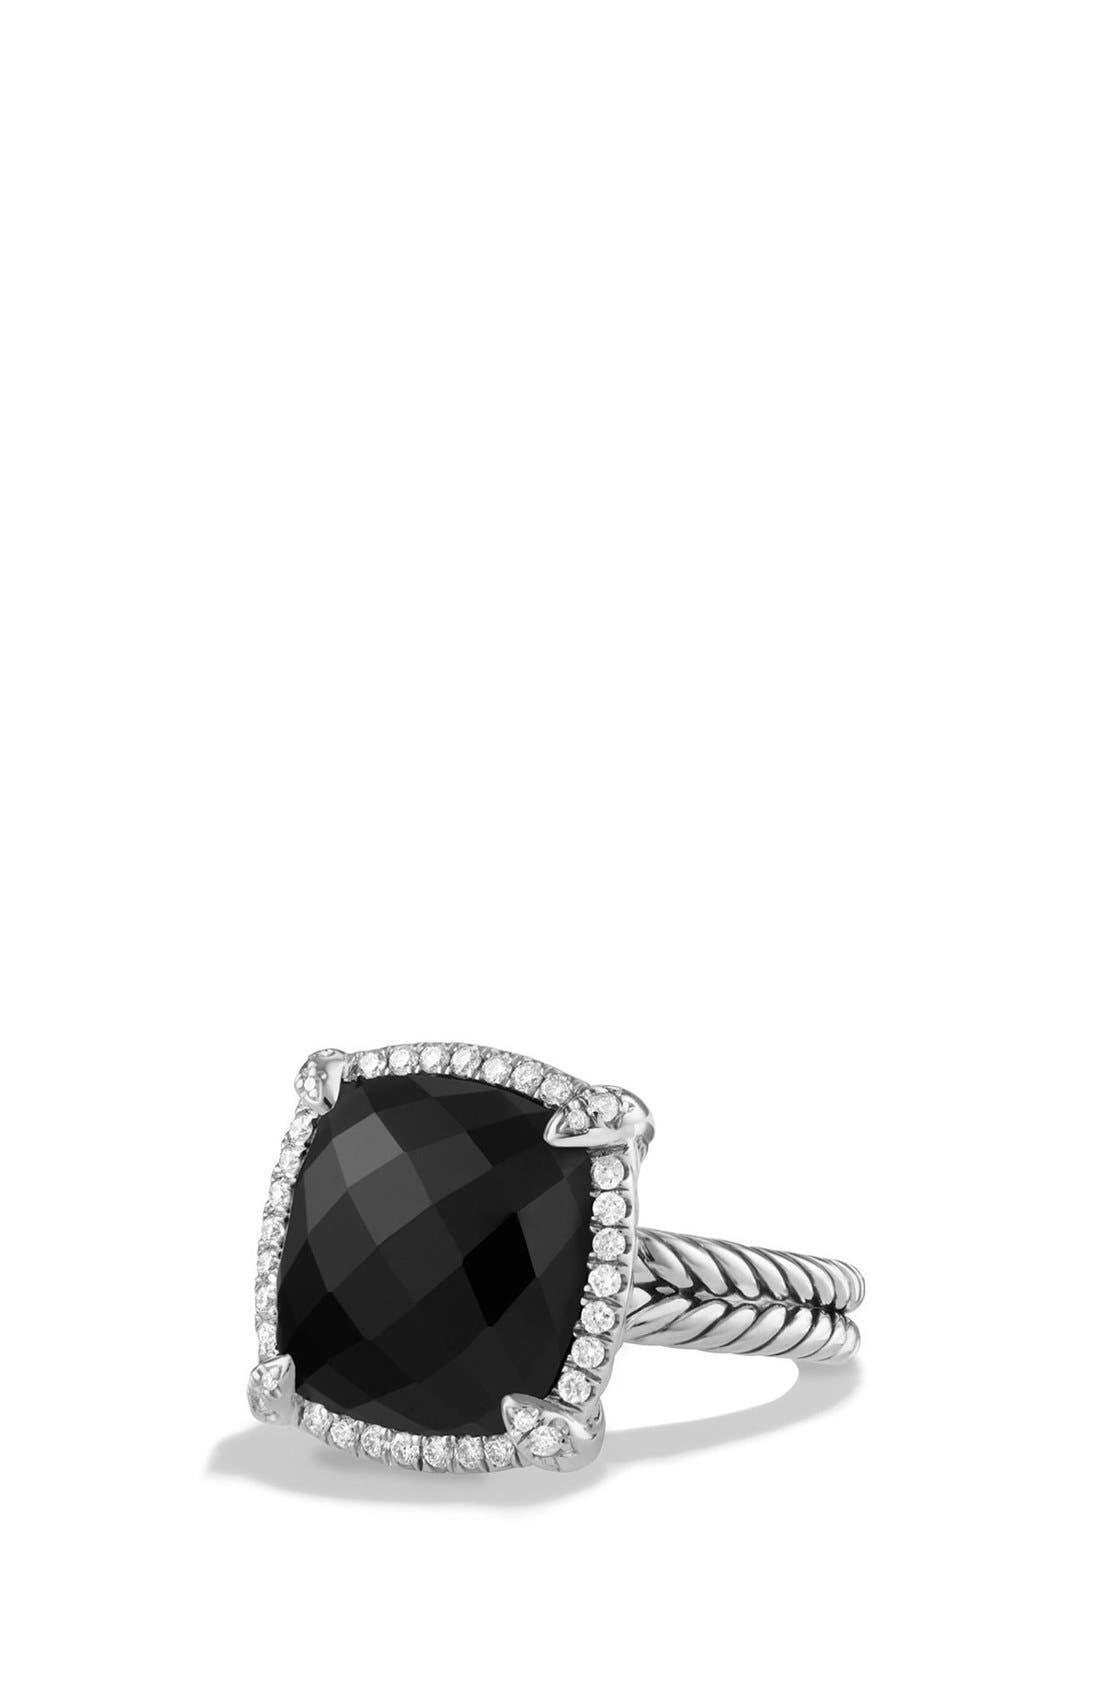 David Yurman 'Châtelaine' Large Pavé Bezel Ring with Diamonds